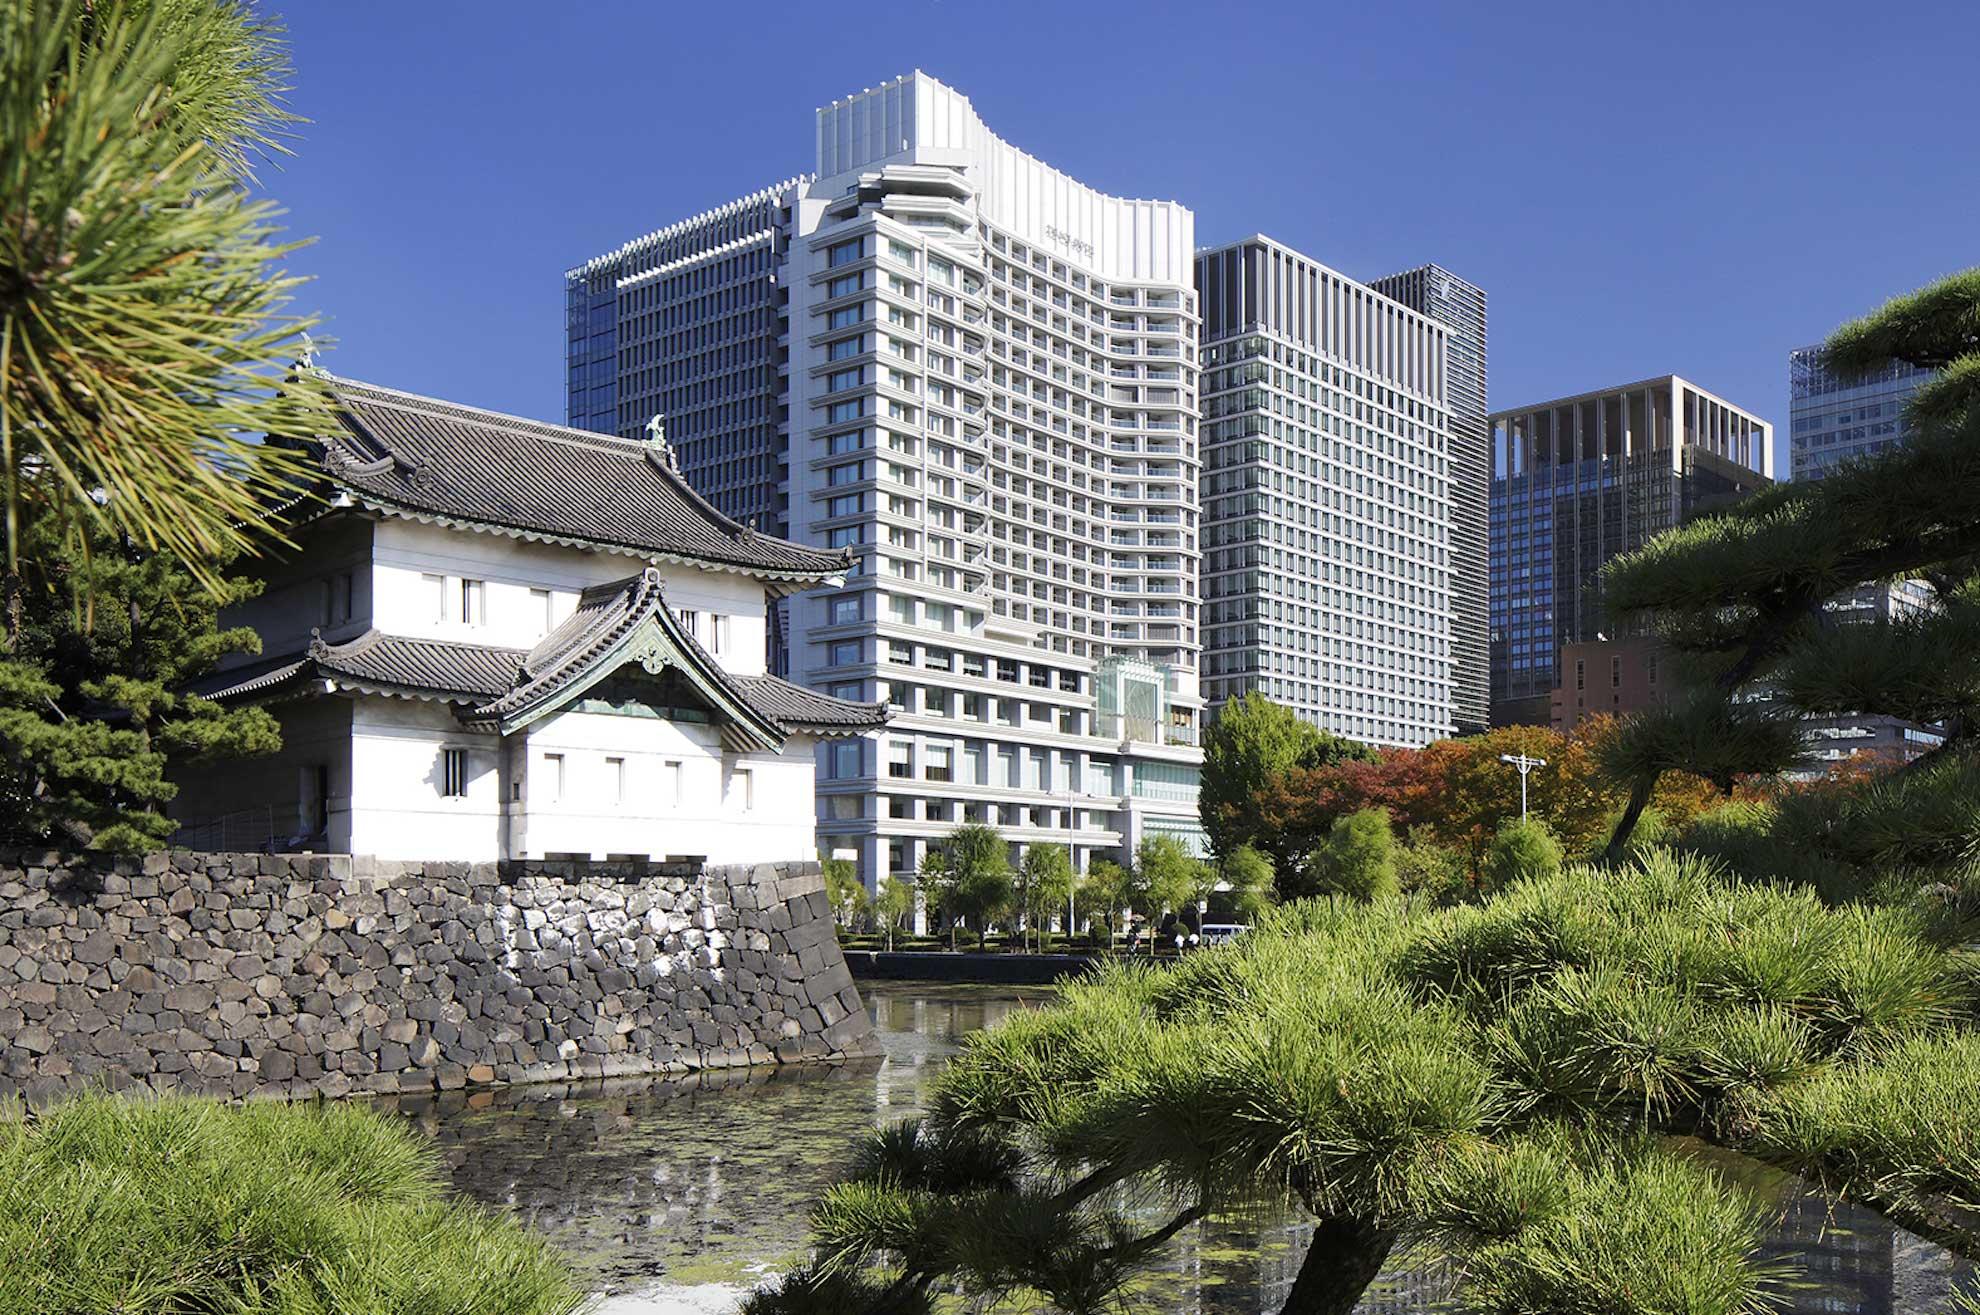 Palace Hotel Tokyo Exterior with Tatsumi Watchtower III F2 1 ART HOTEL NEL MONDO